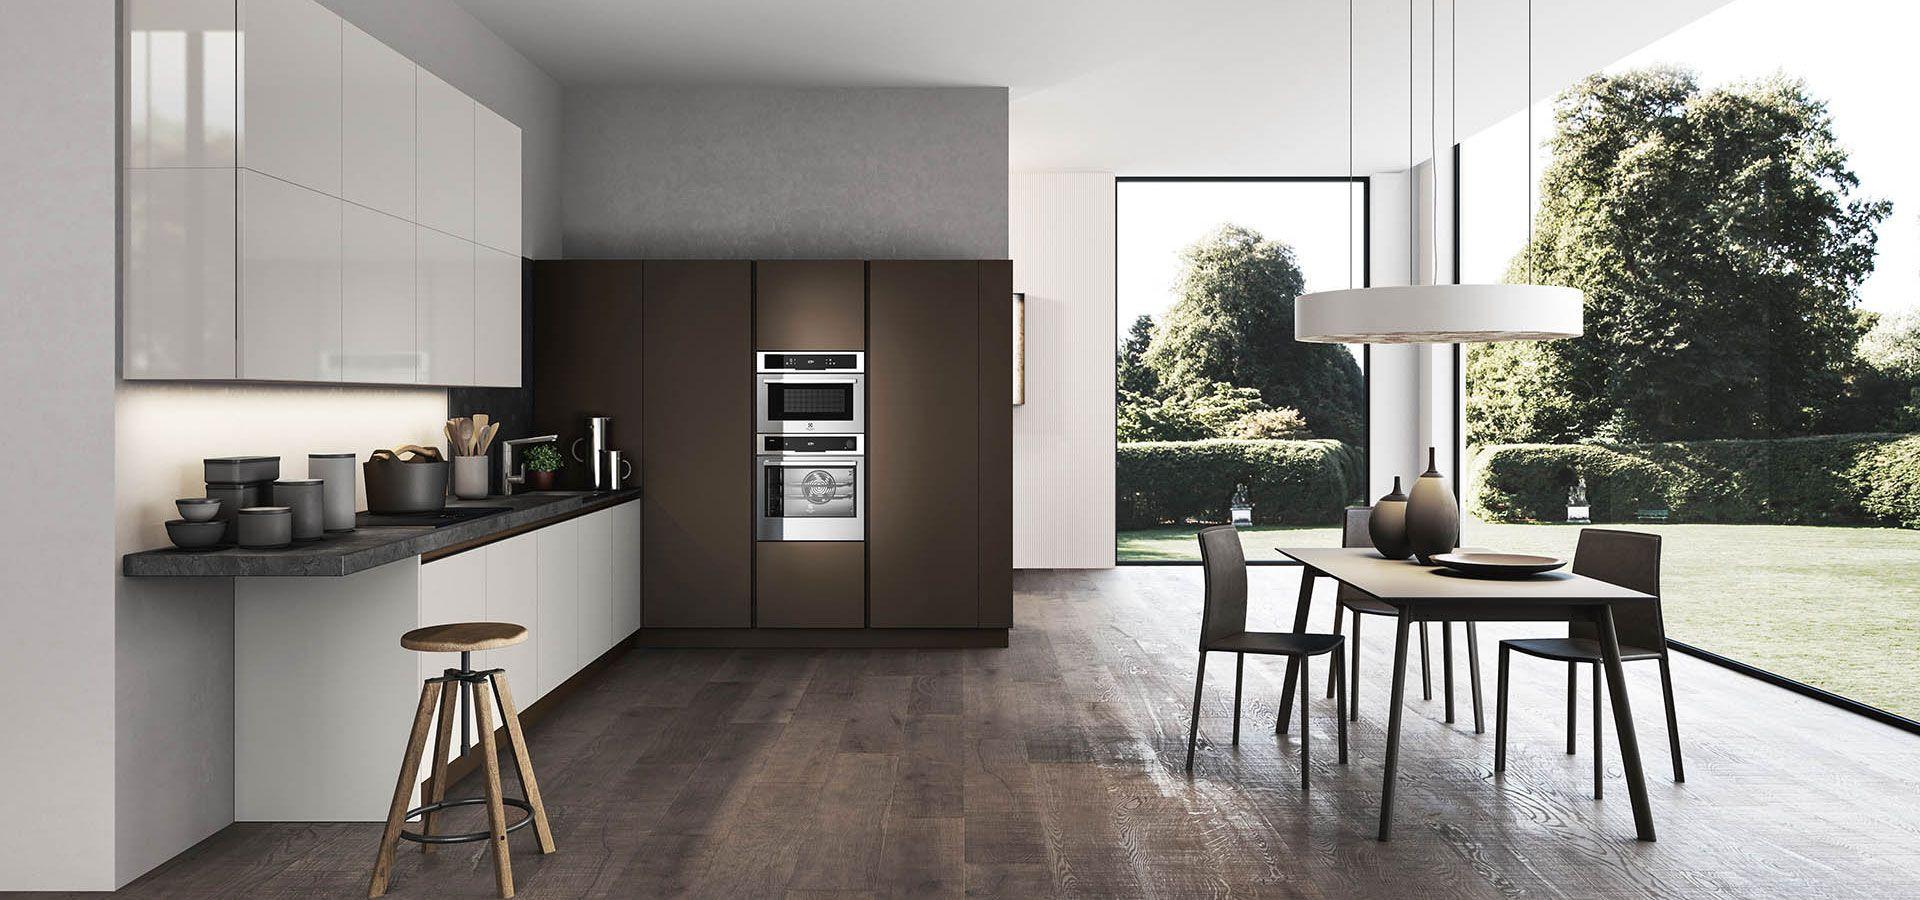 cucina moderna - time finiture: nebbia opaco, nebbia lucido ... - Cucina Febal Light La Qualita Accessibile